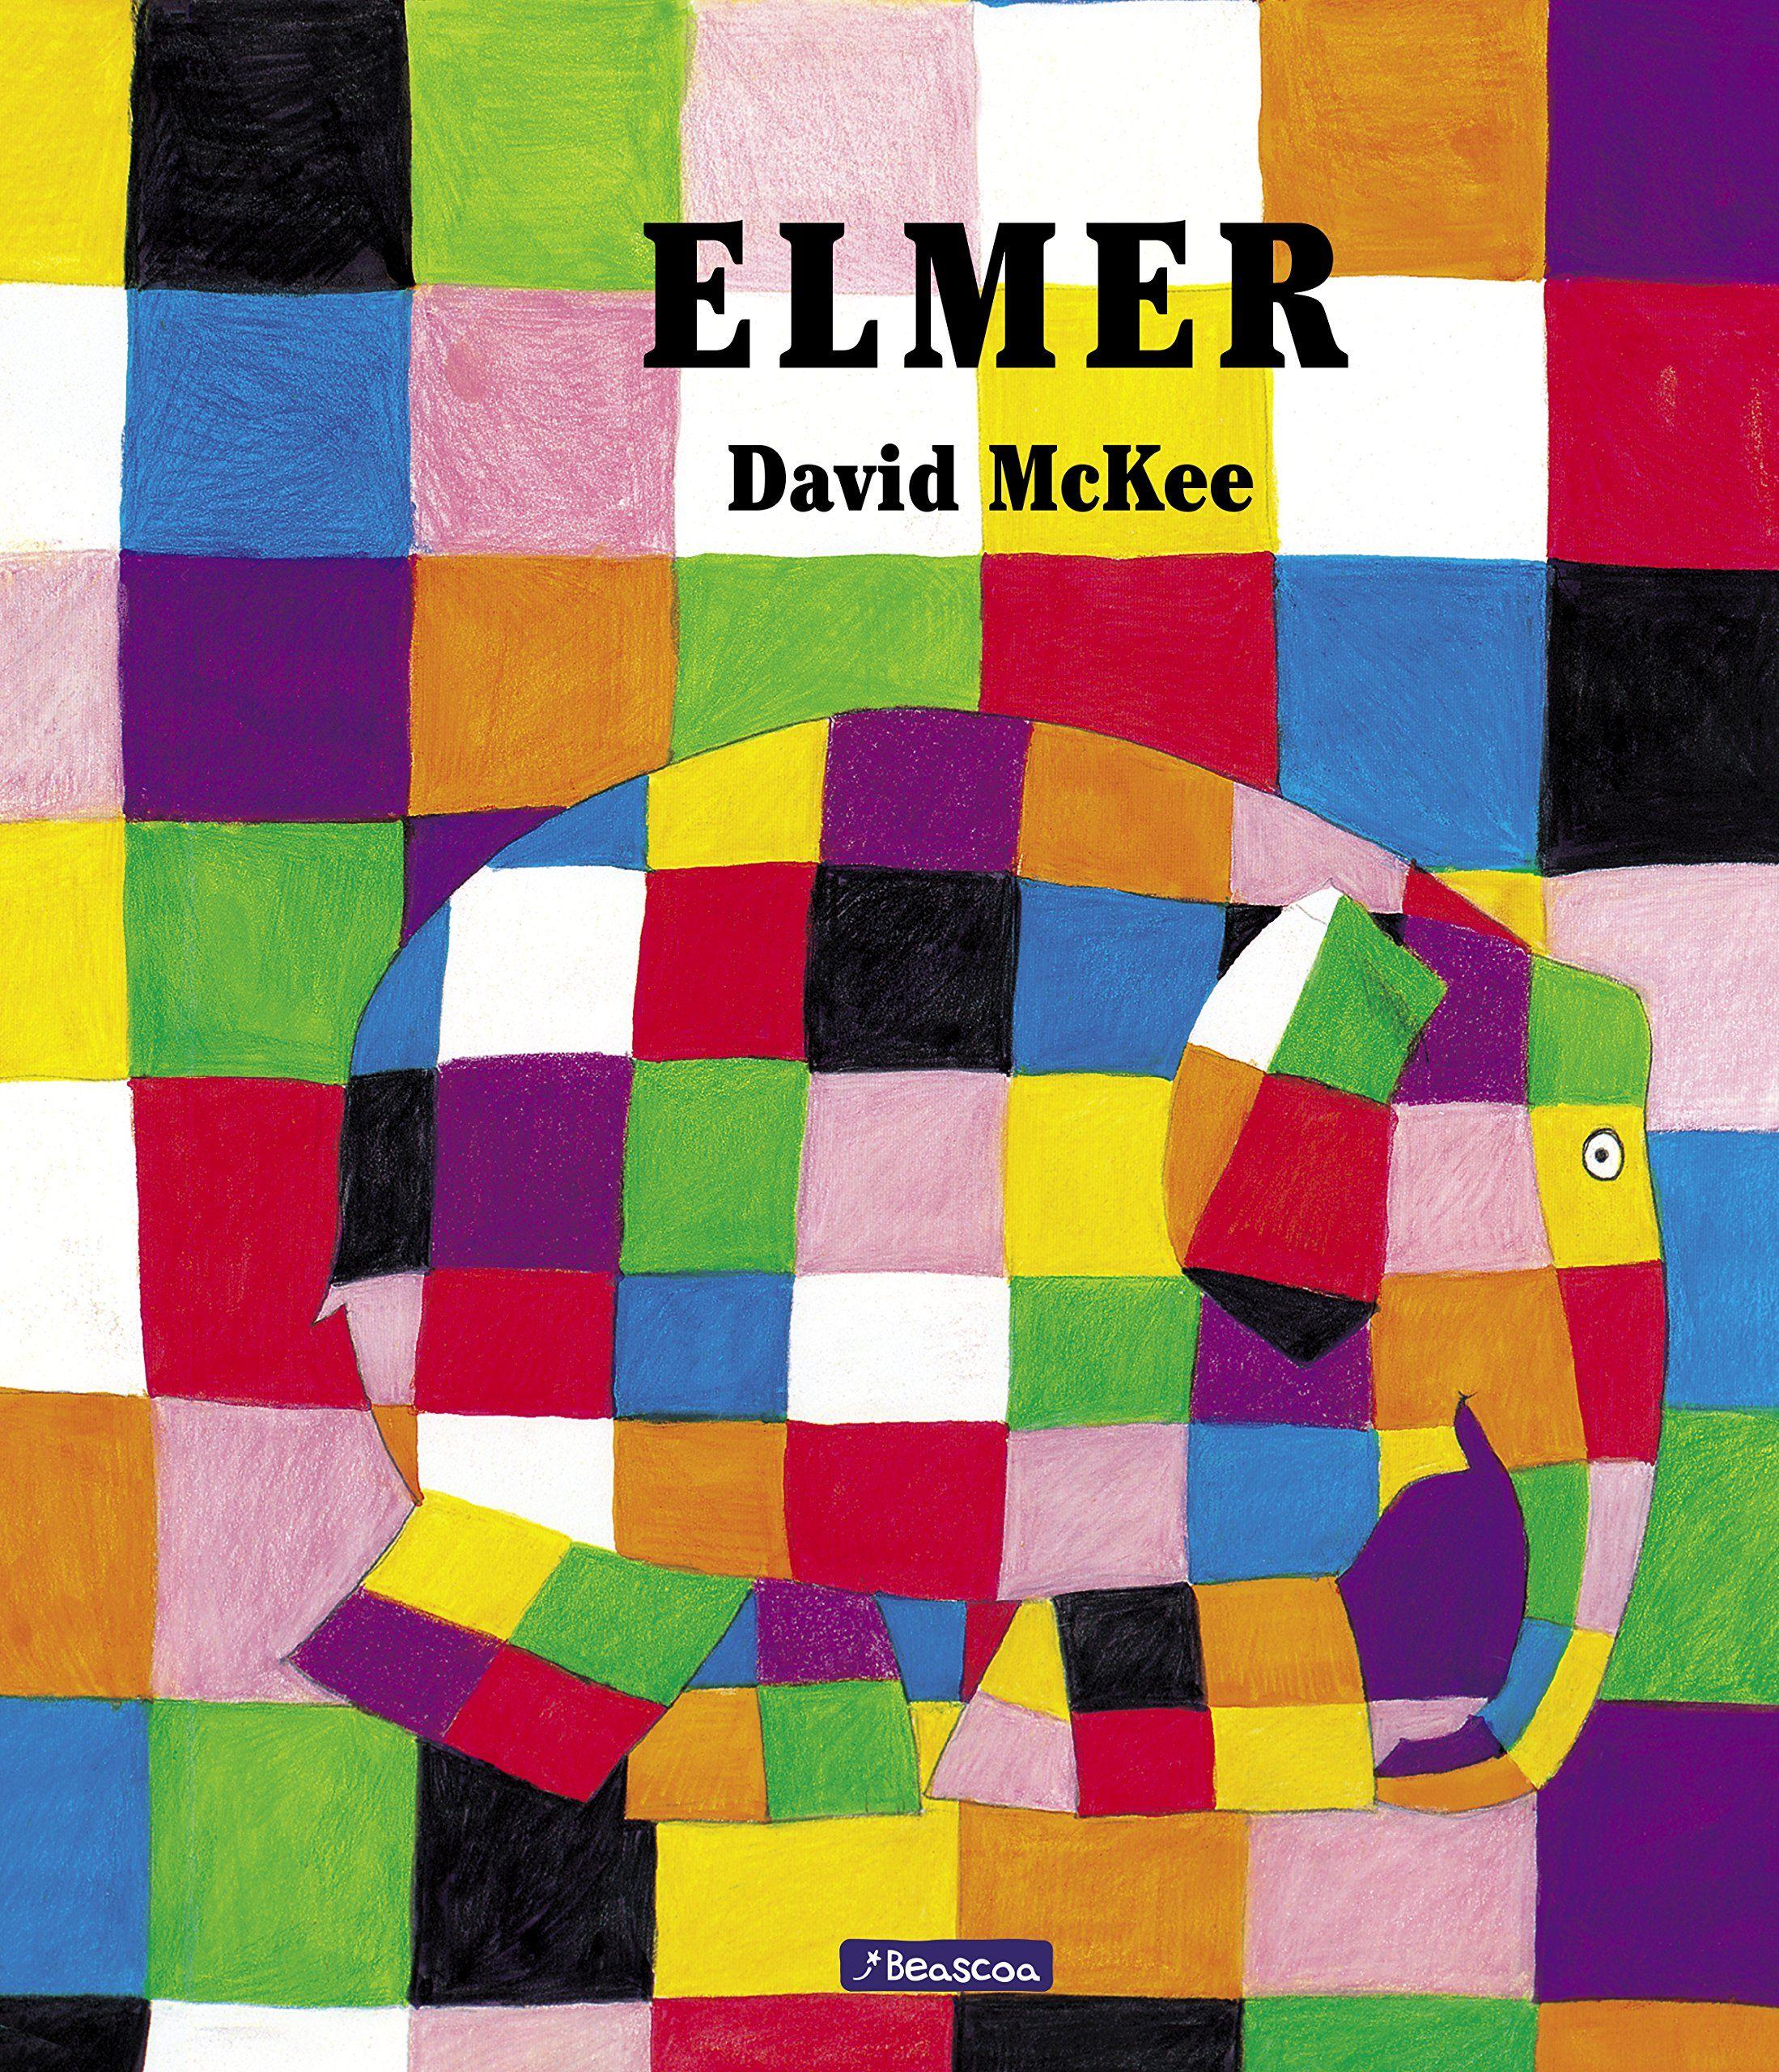 Elmer, David McKee